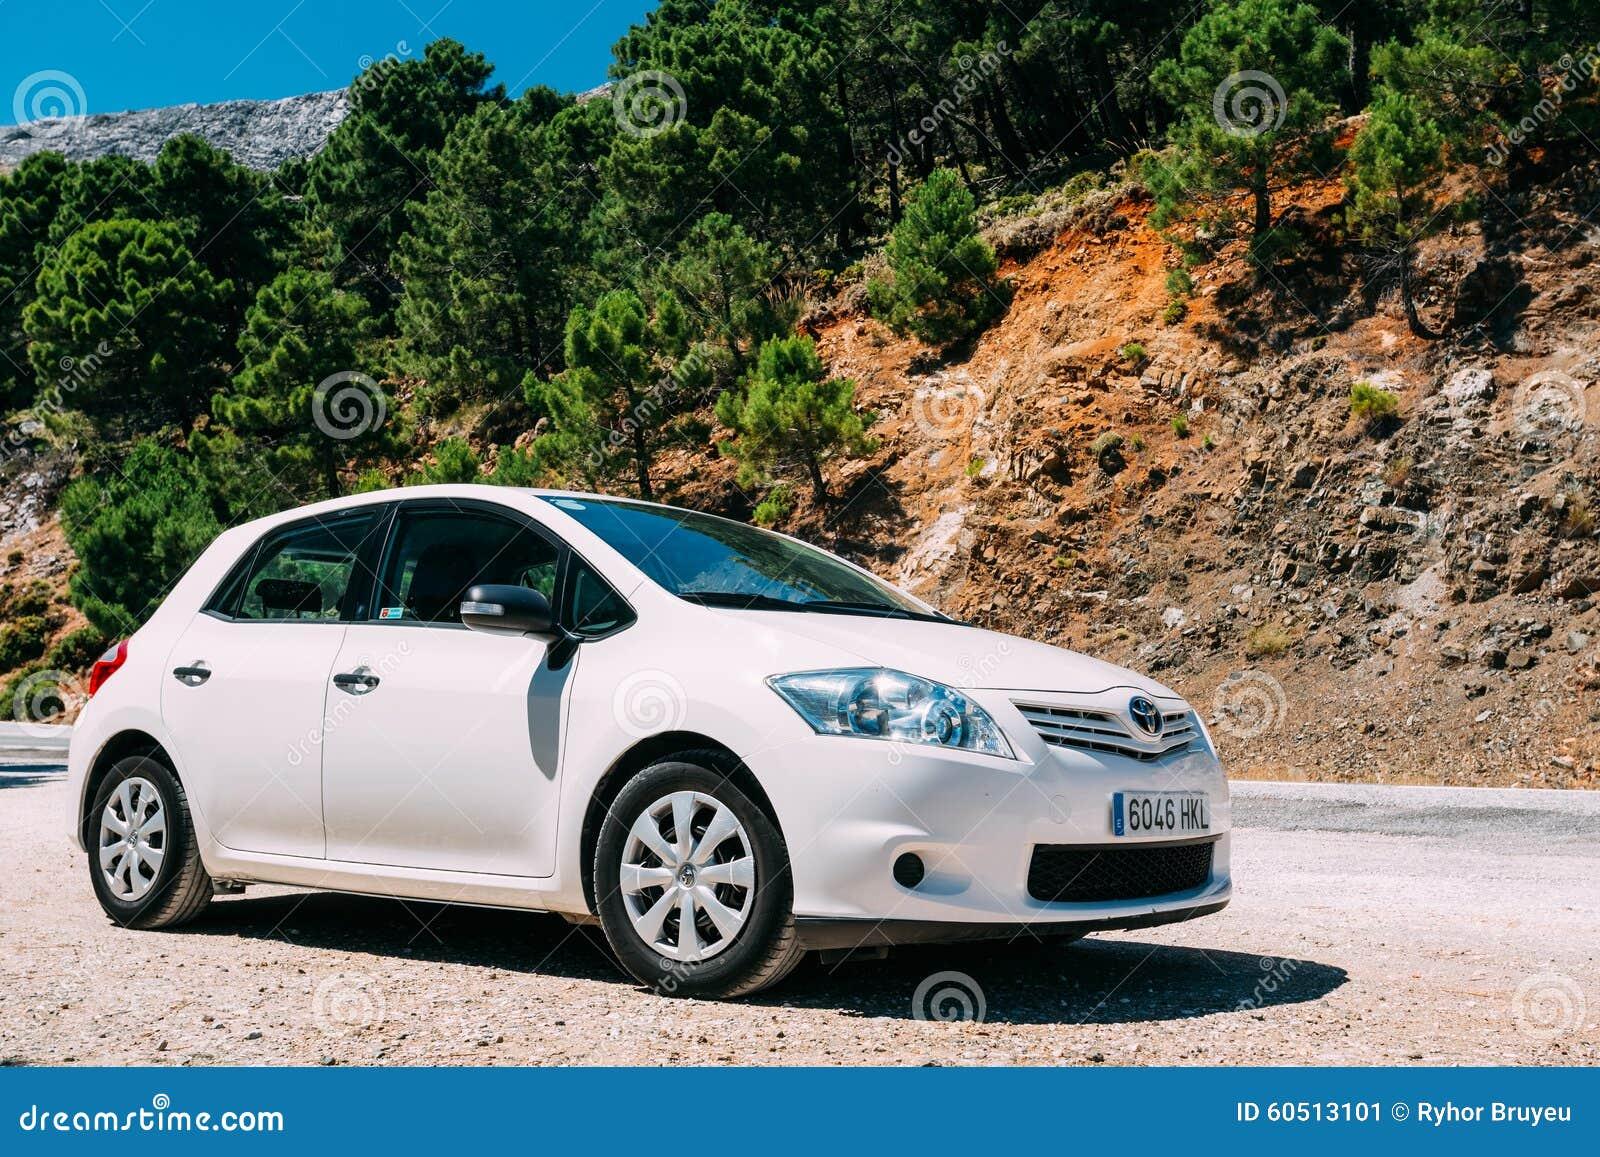 white color toyota auris car on spain nature editorial photo image 60513101. Black Bedroom Furniture Sets. Home Design Ideas